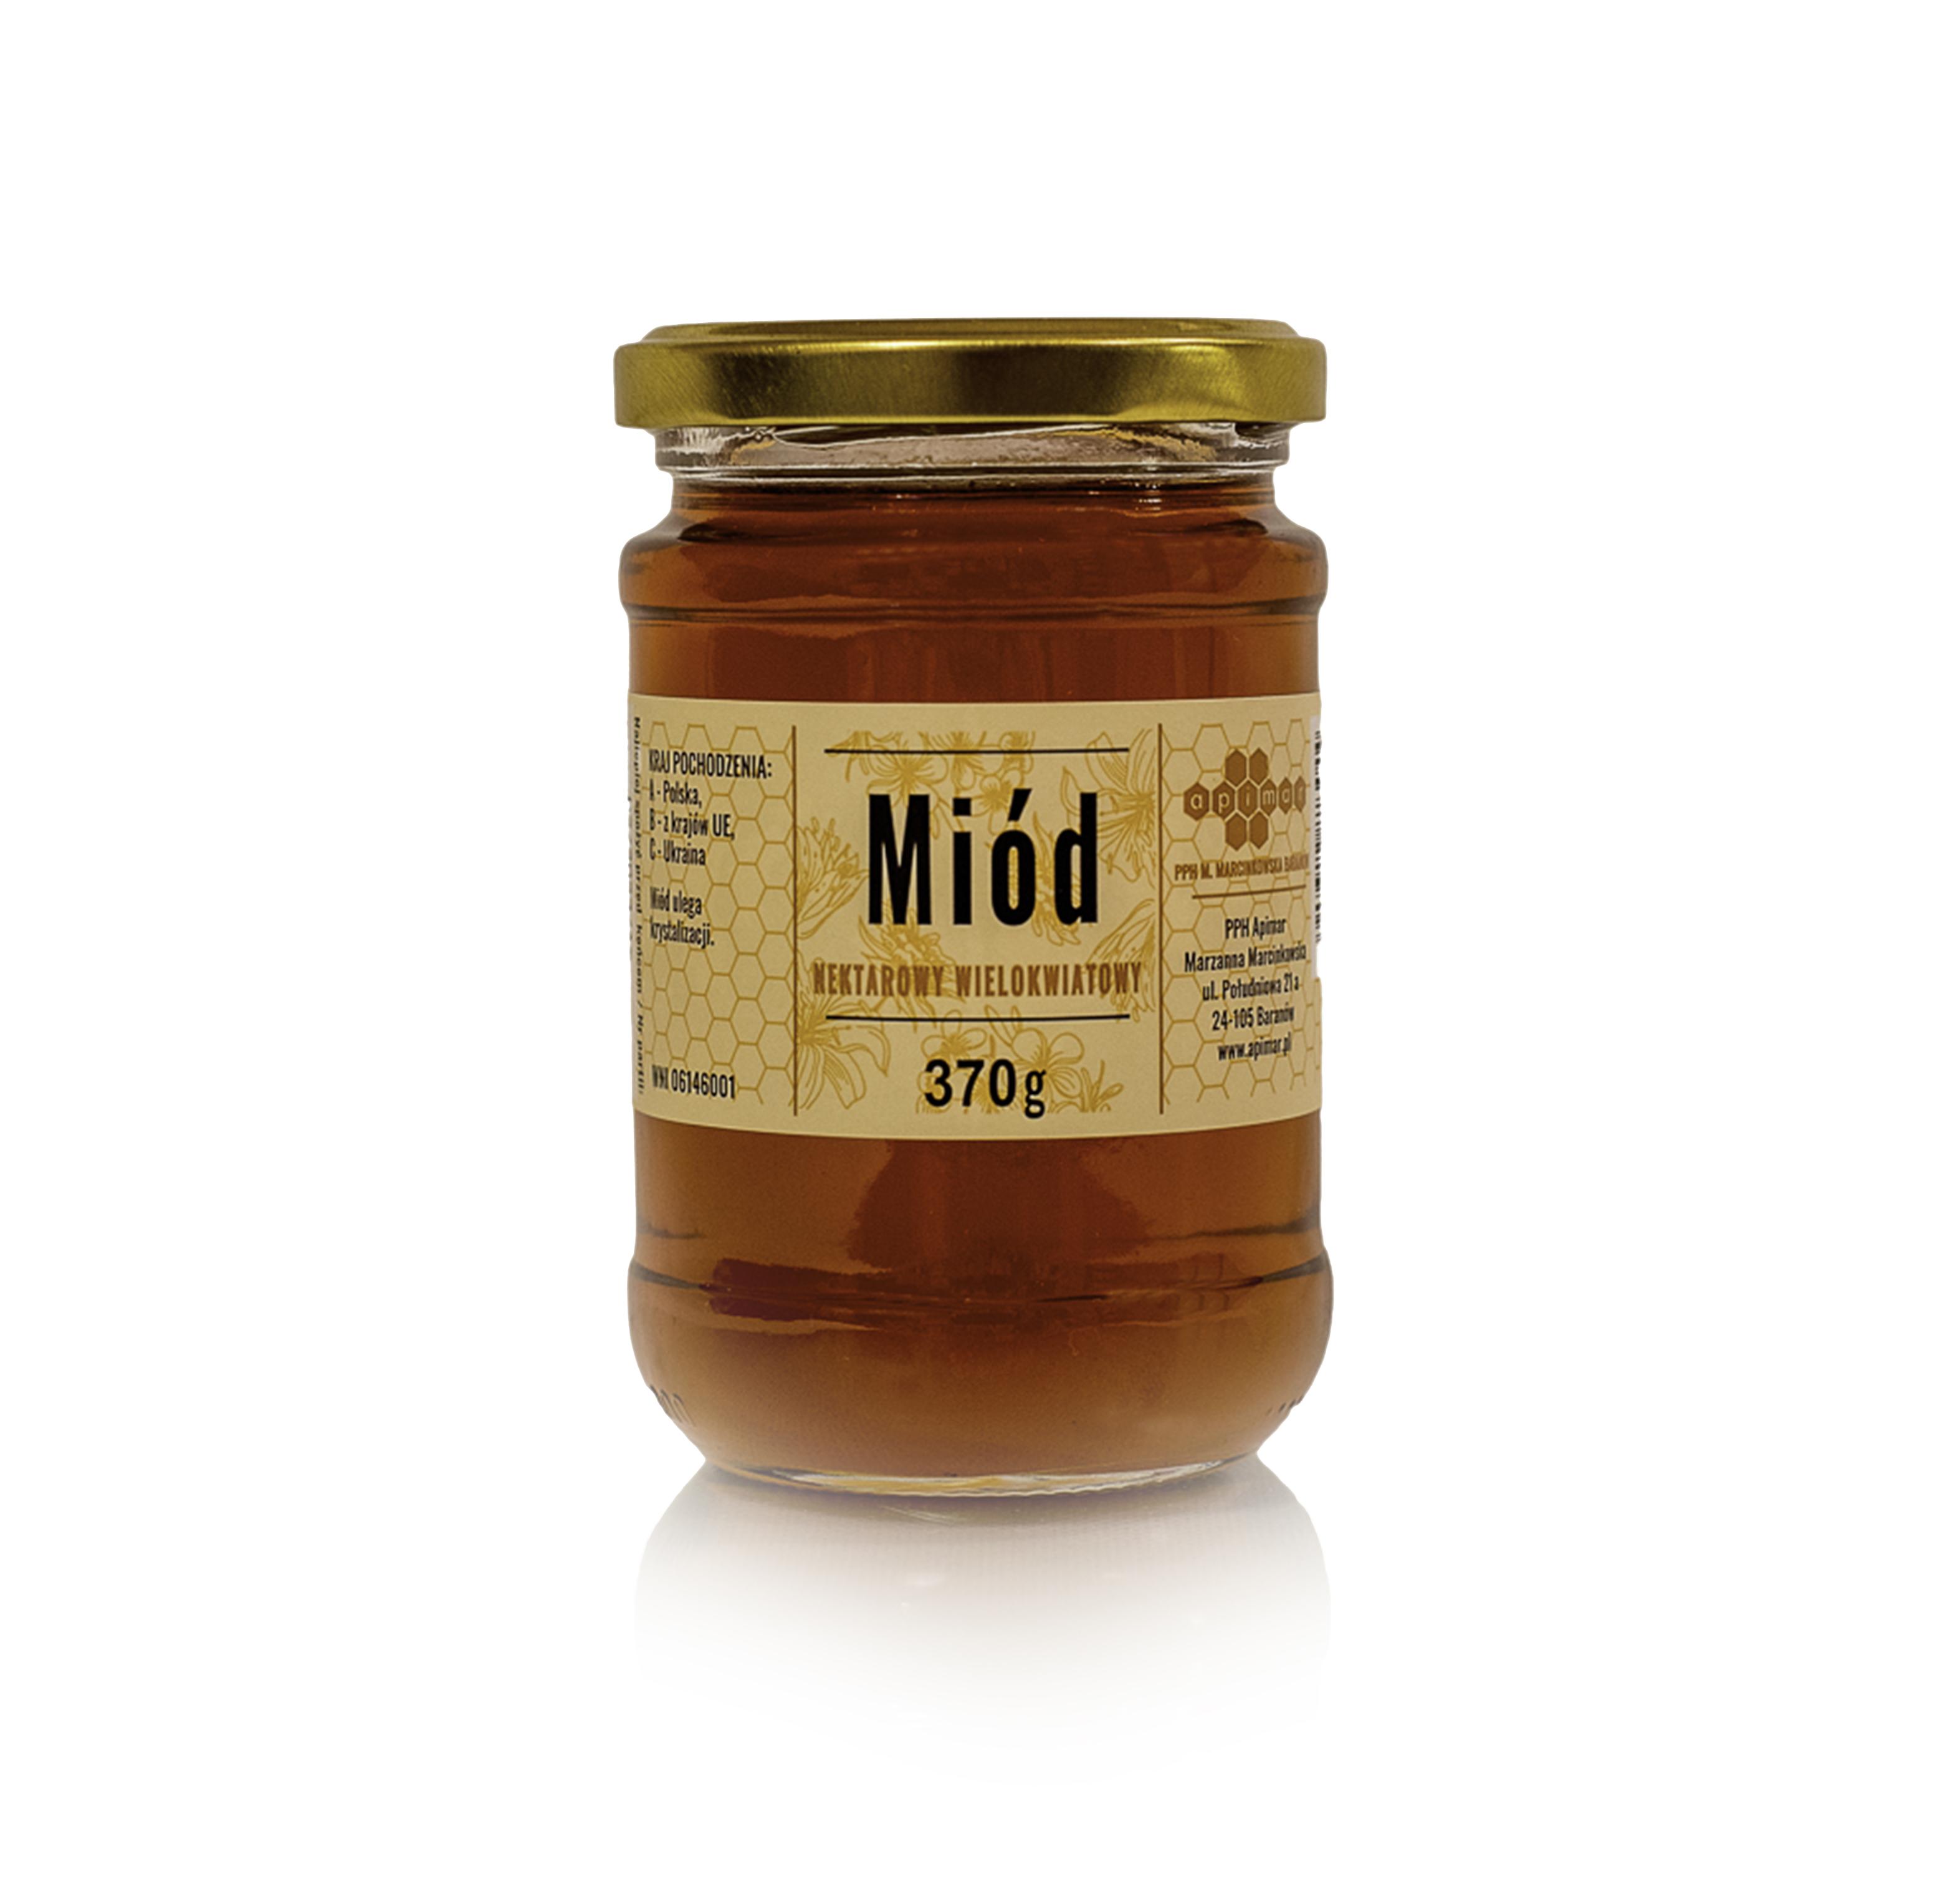 Polyfloral honey 370g